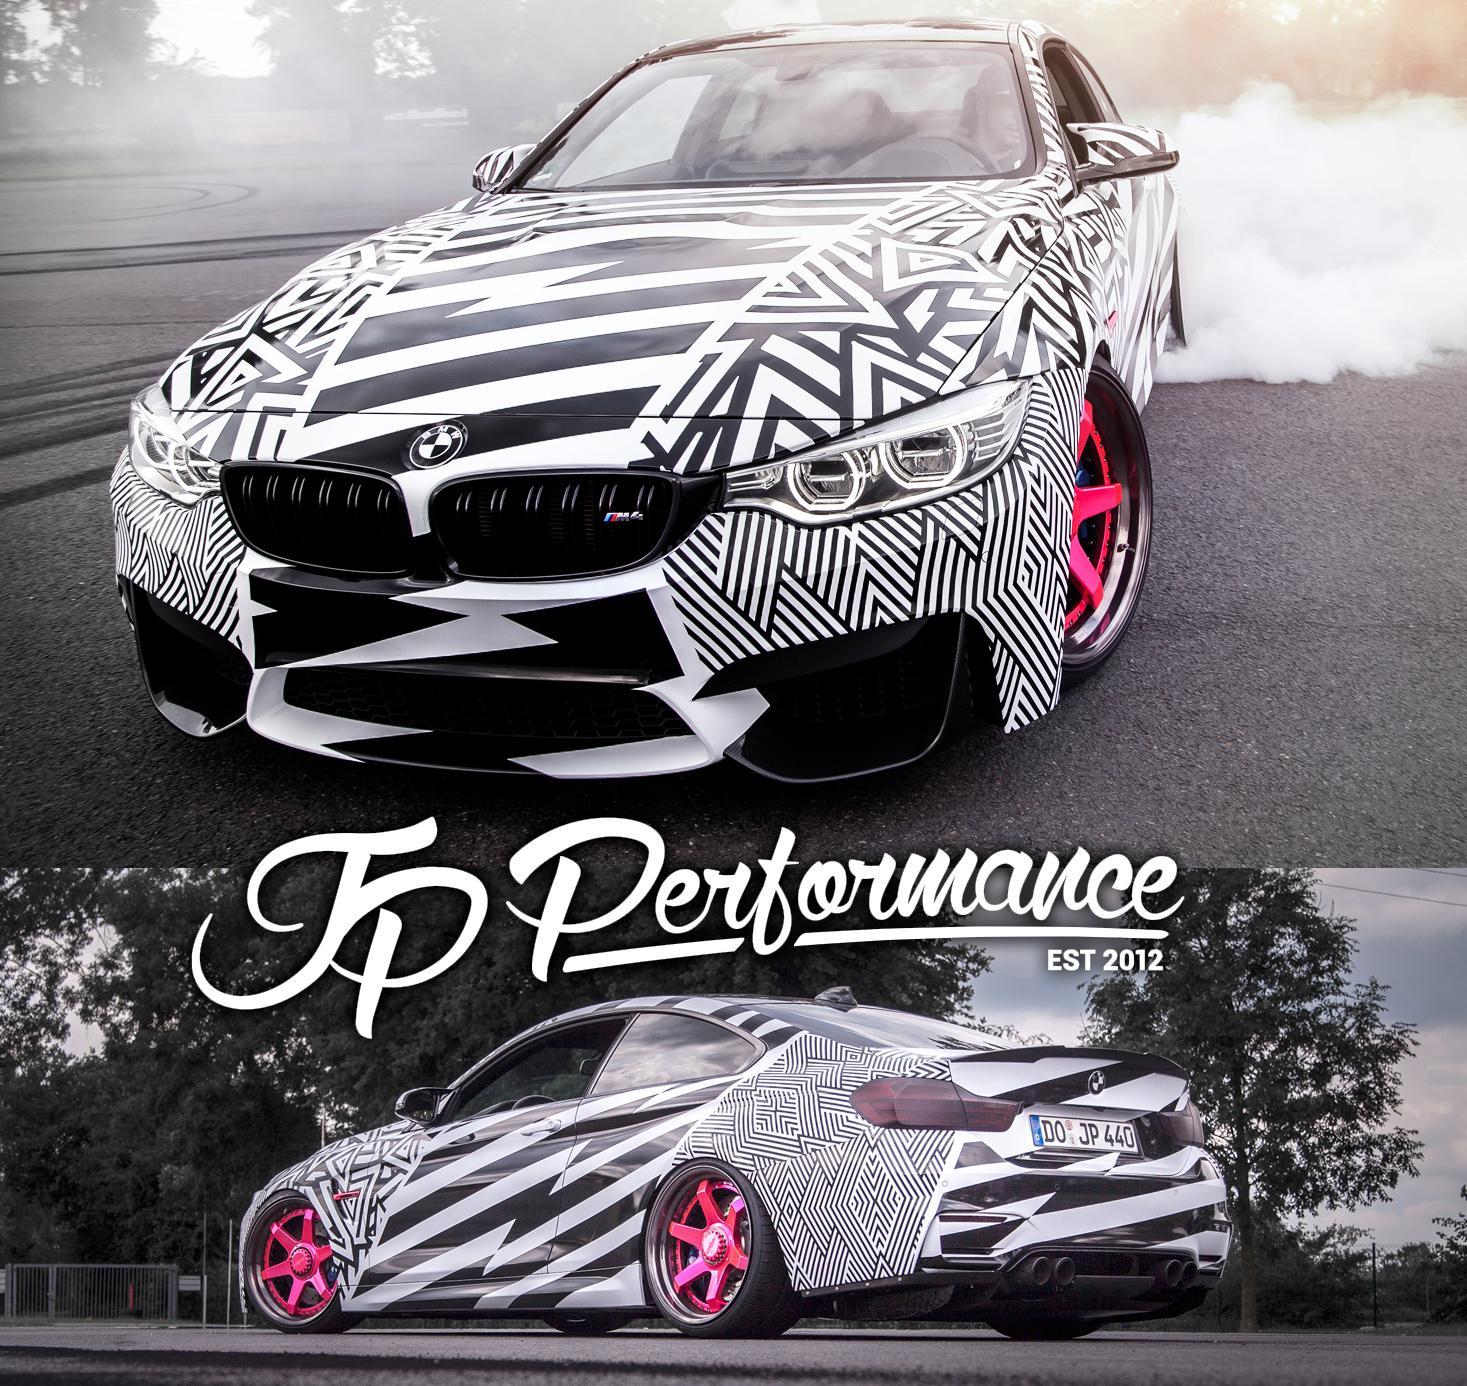 Drift Car Wallpaper Hd Jp Performance Bmw M4 Gta5 Mods Com